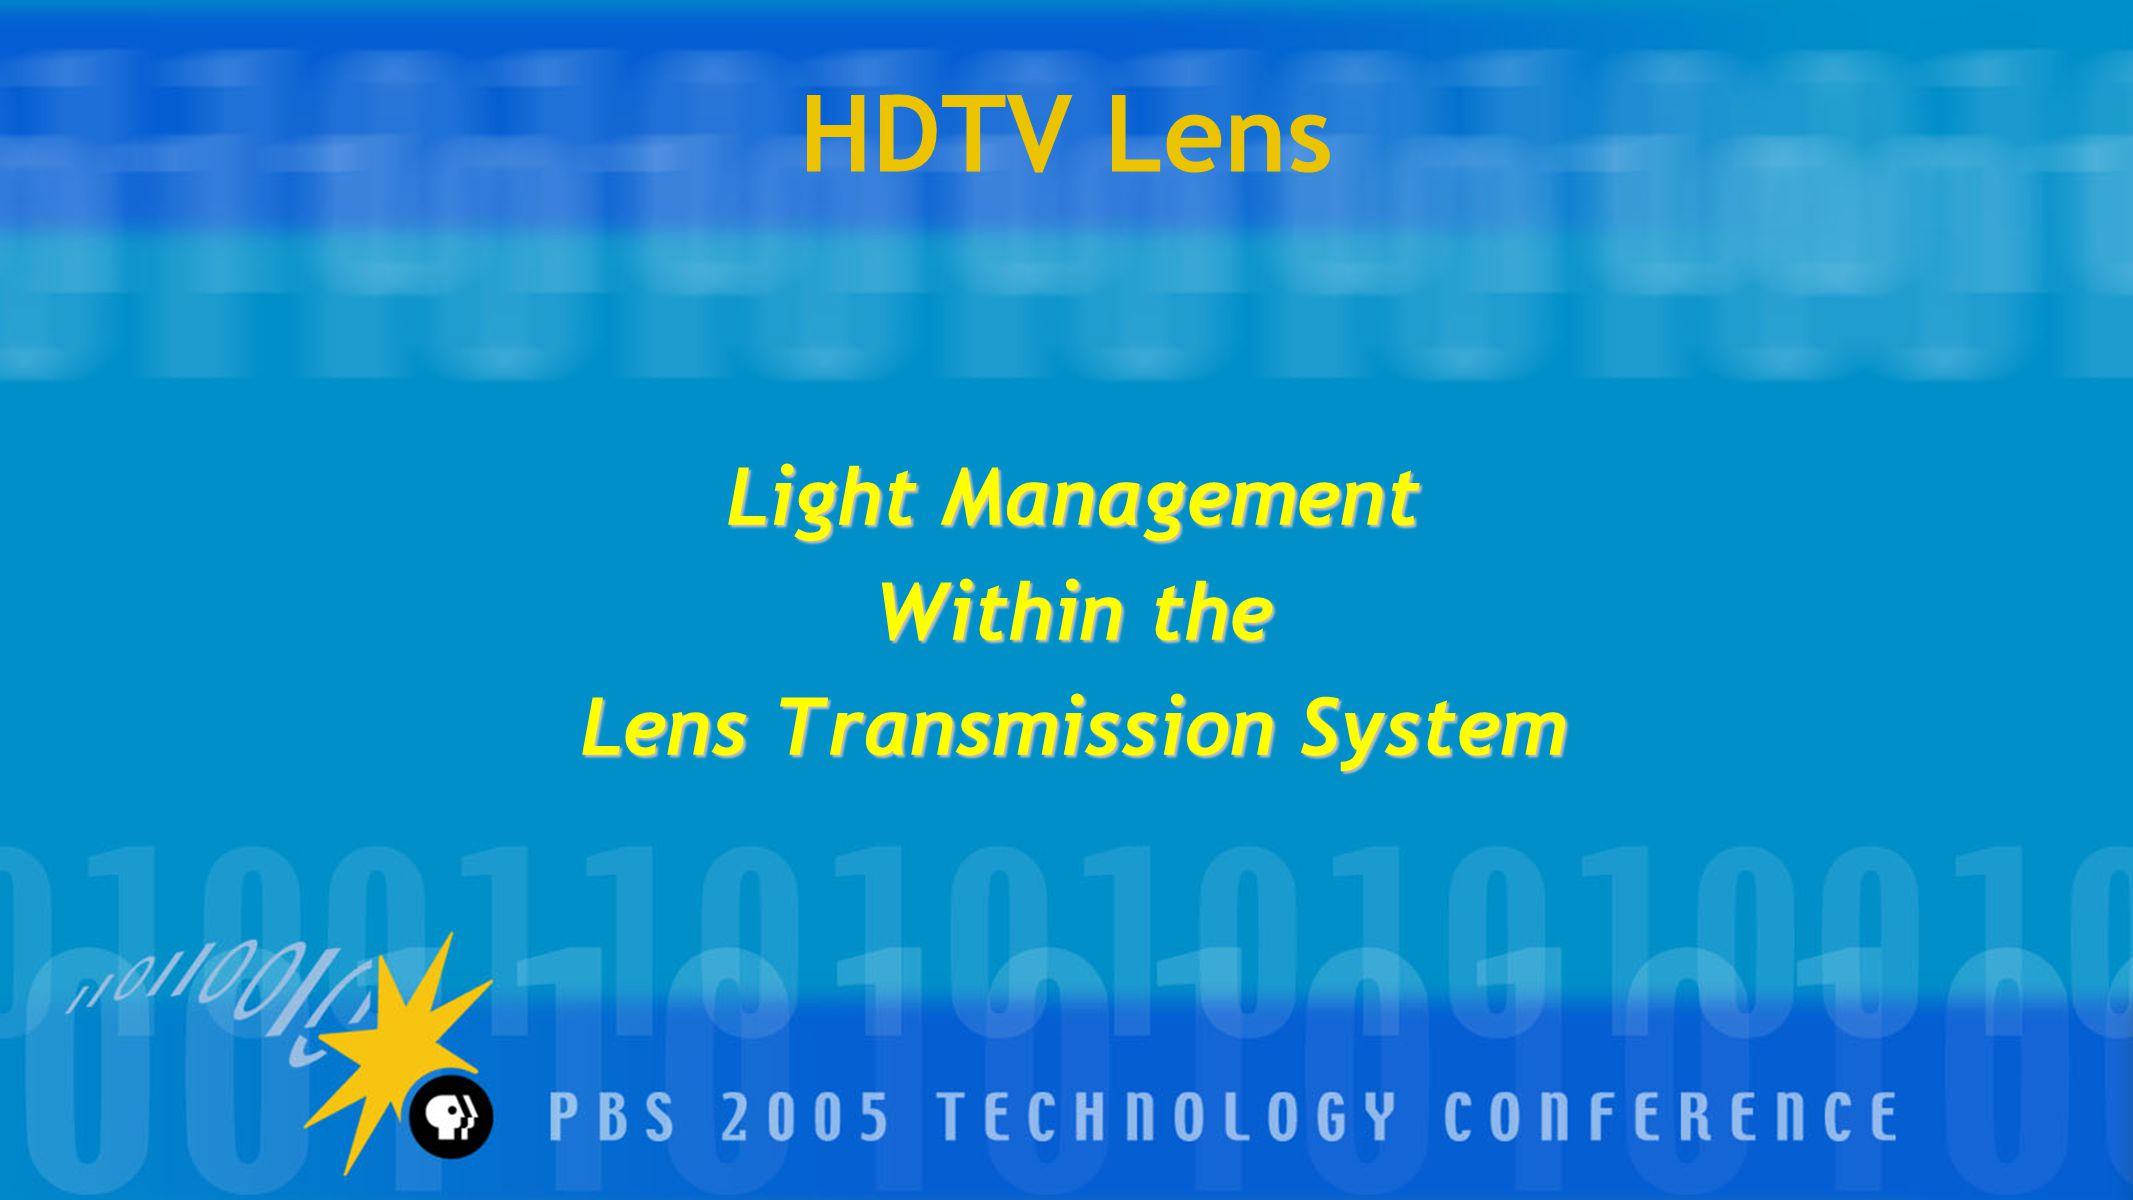 HDTV Lens Light Management Within the Lens Transmission System